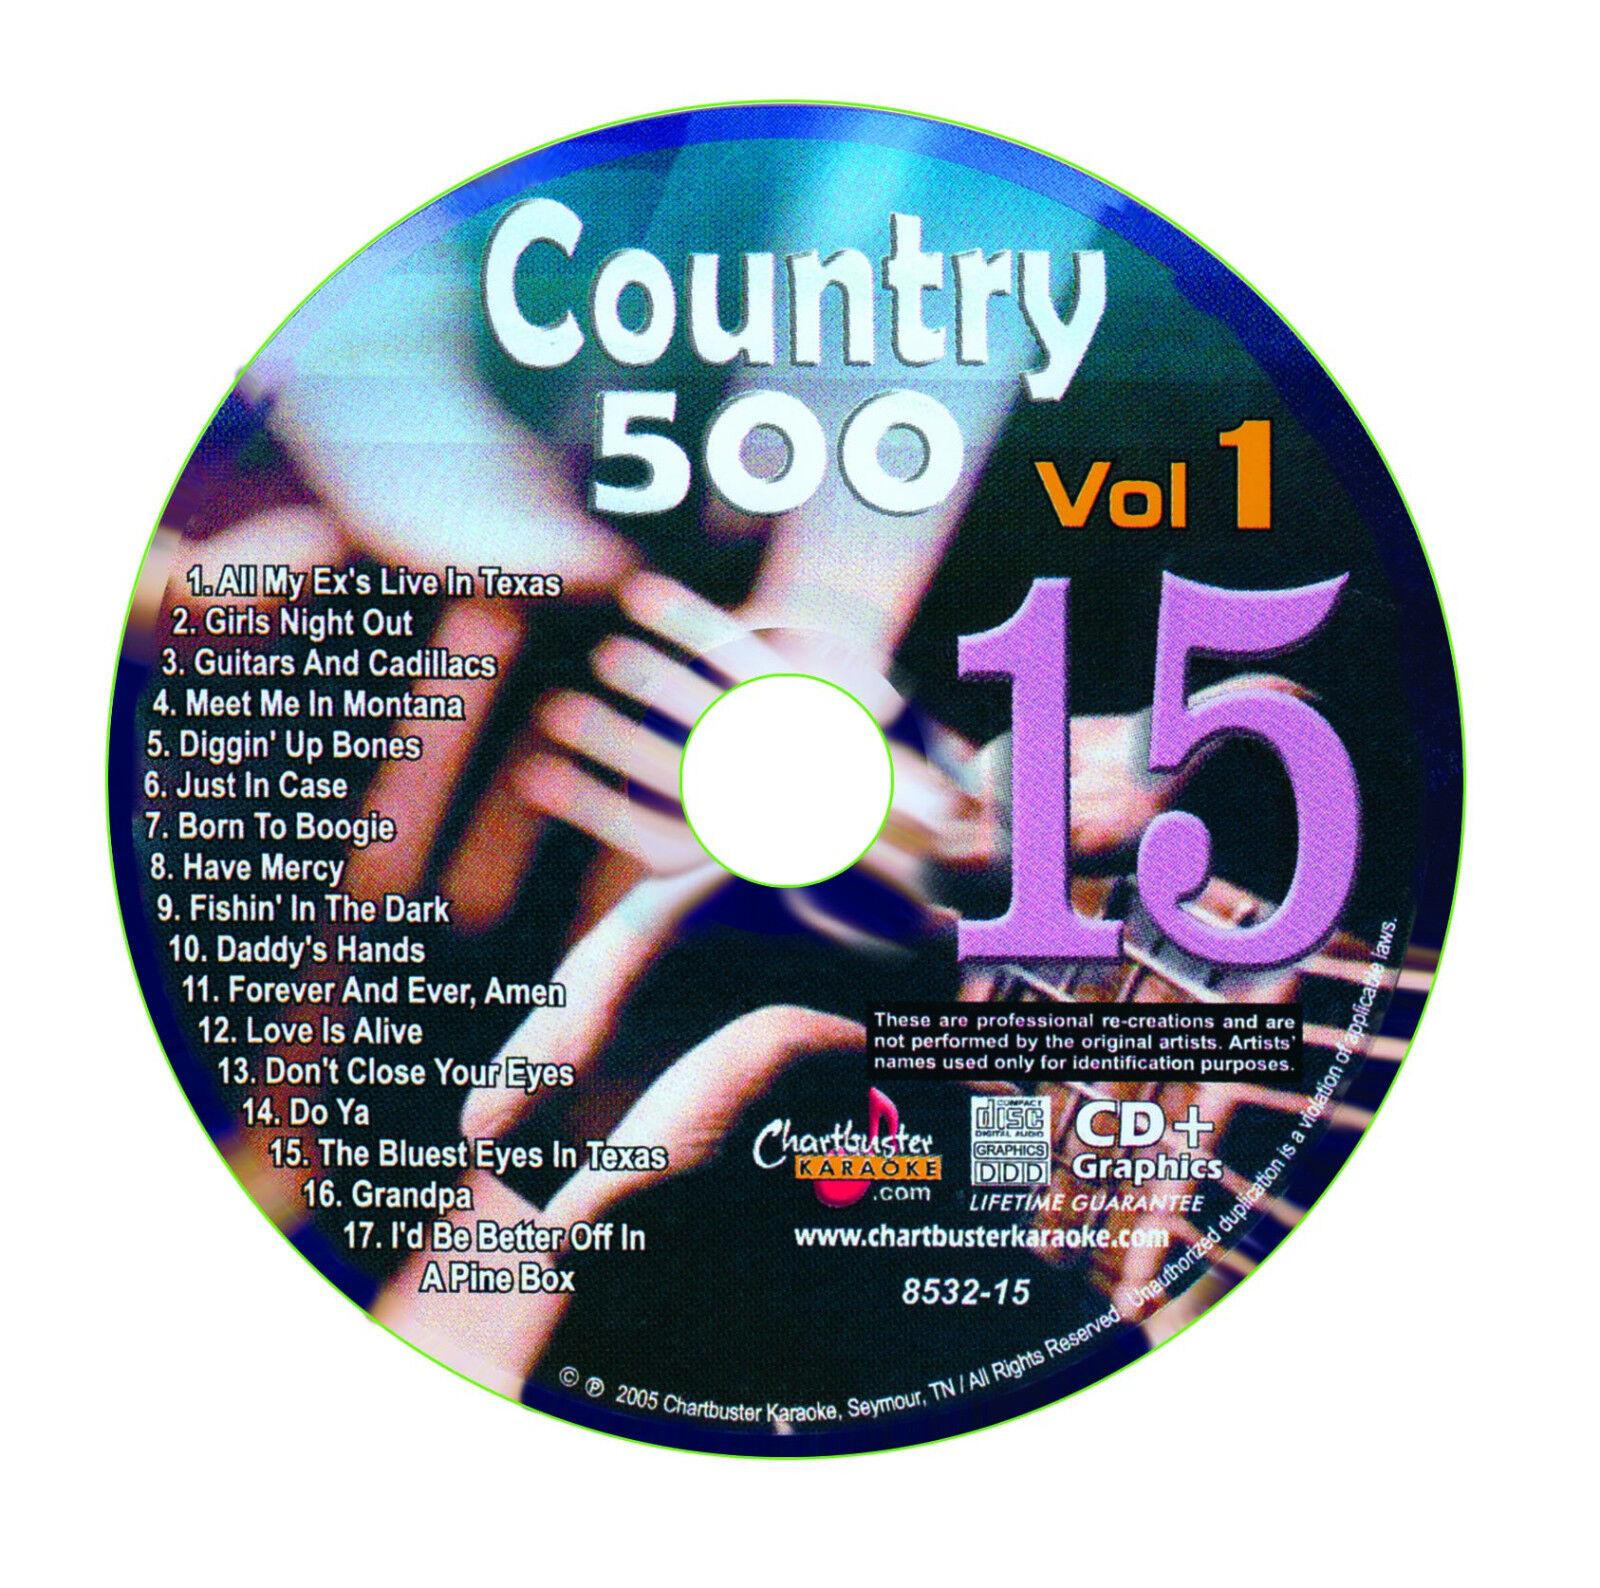 как выглядит KARAOKE CHARTBUSTER CD G COUNTRY 500 CB8532 VOL.1 DISC 15 фото